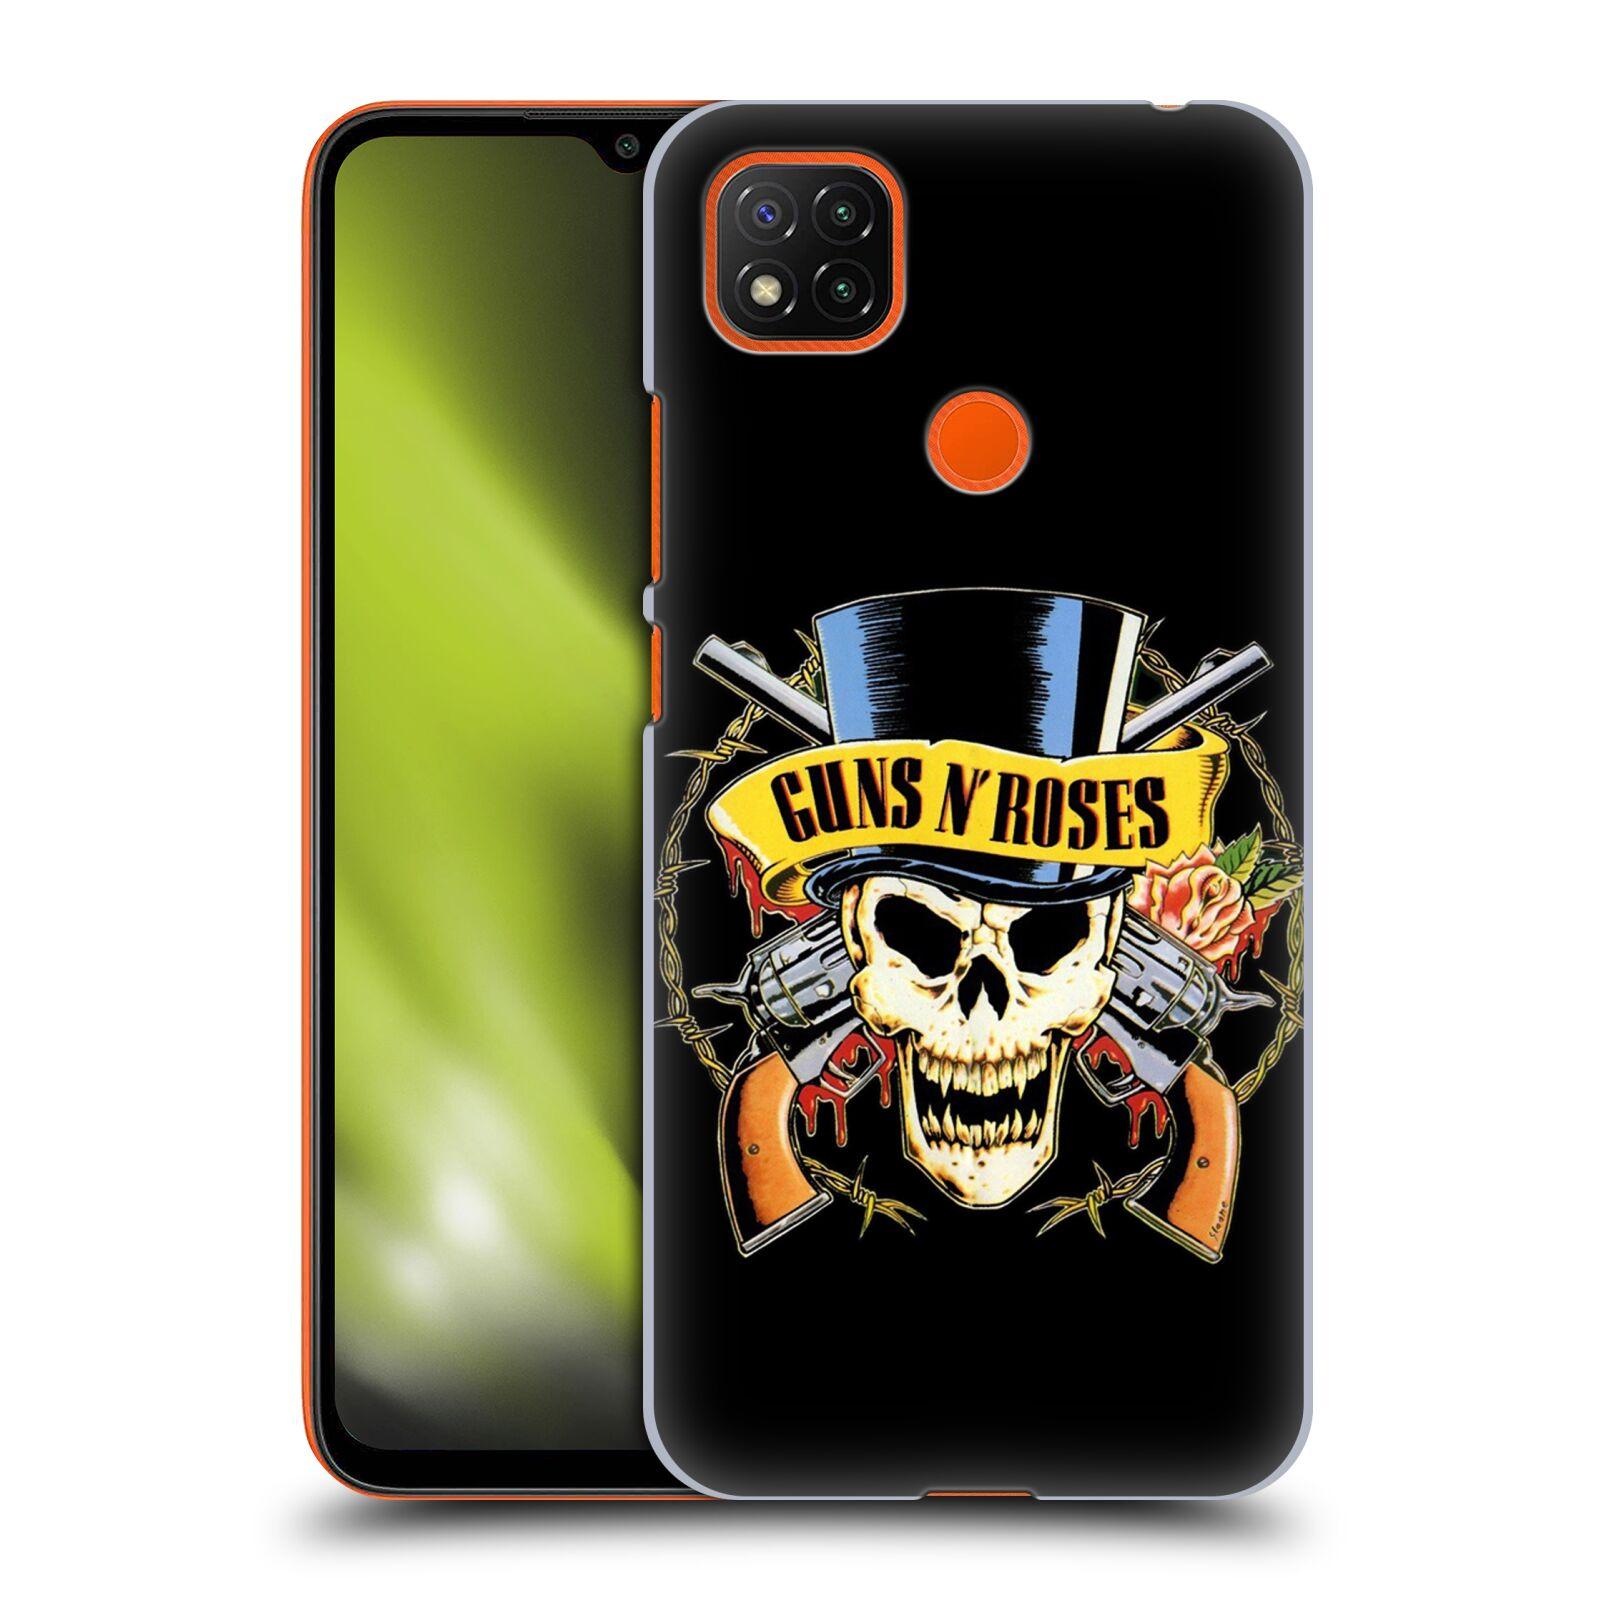 Plastové pouzdro na mobil Xiaomi Redmi 9C - Head Case - Guns N' Roses - Lebka